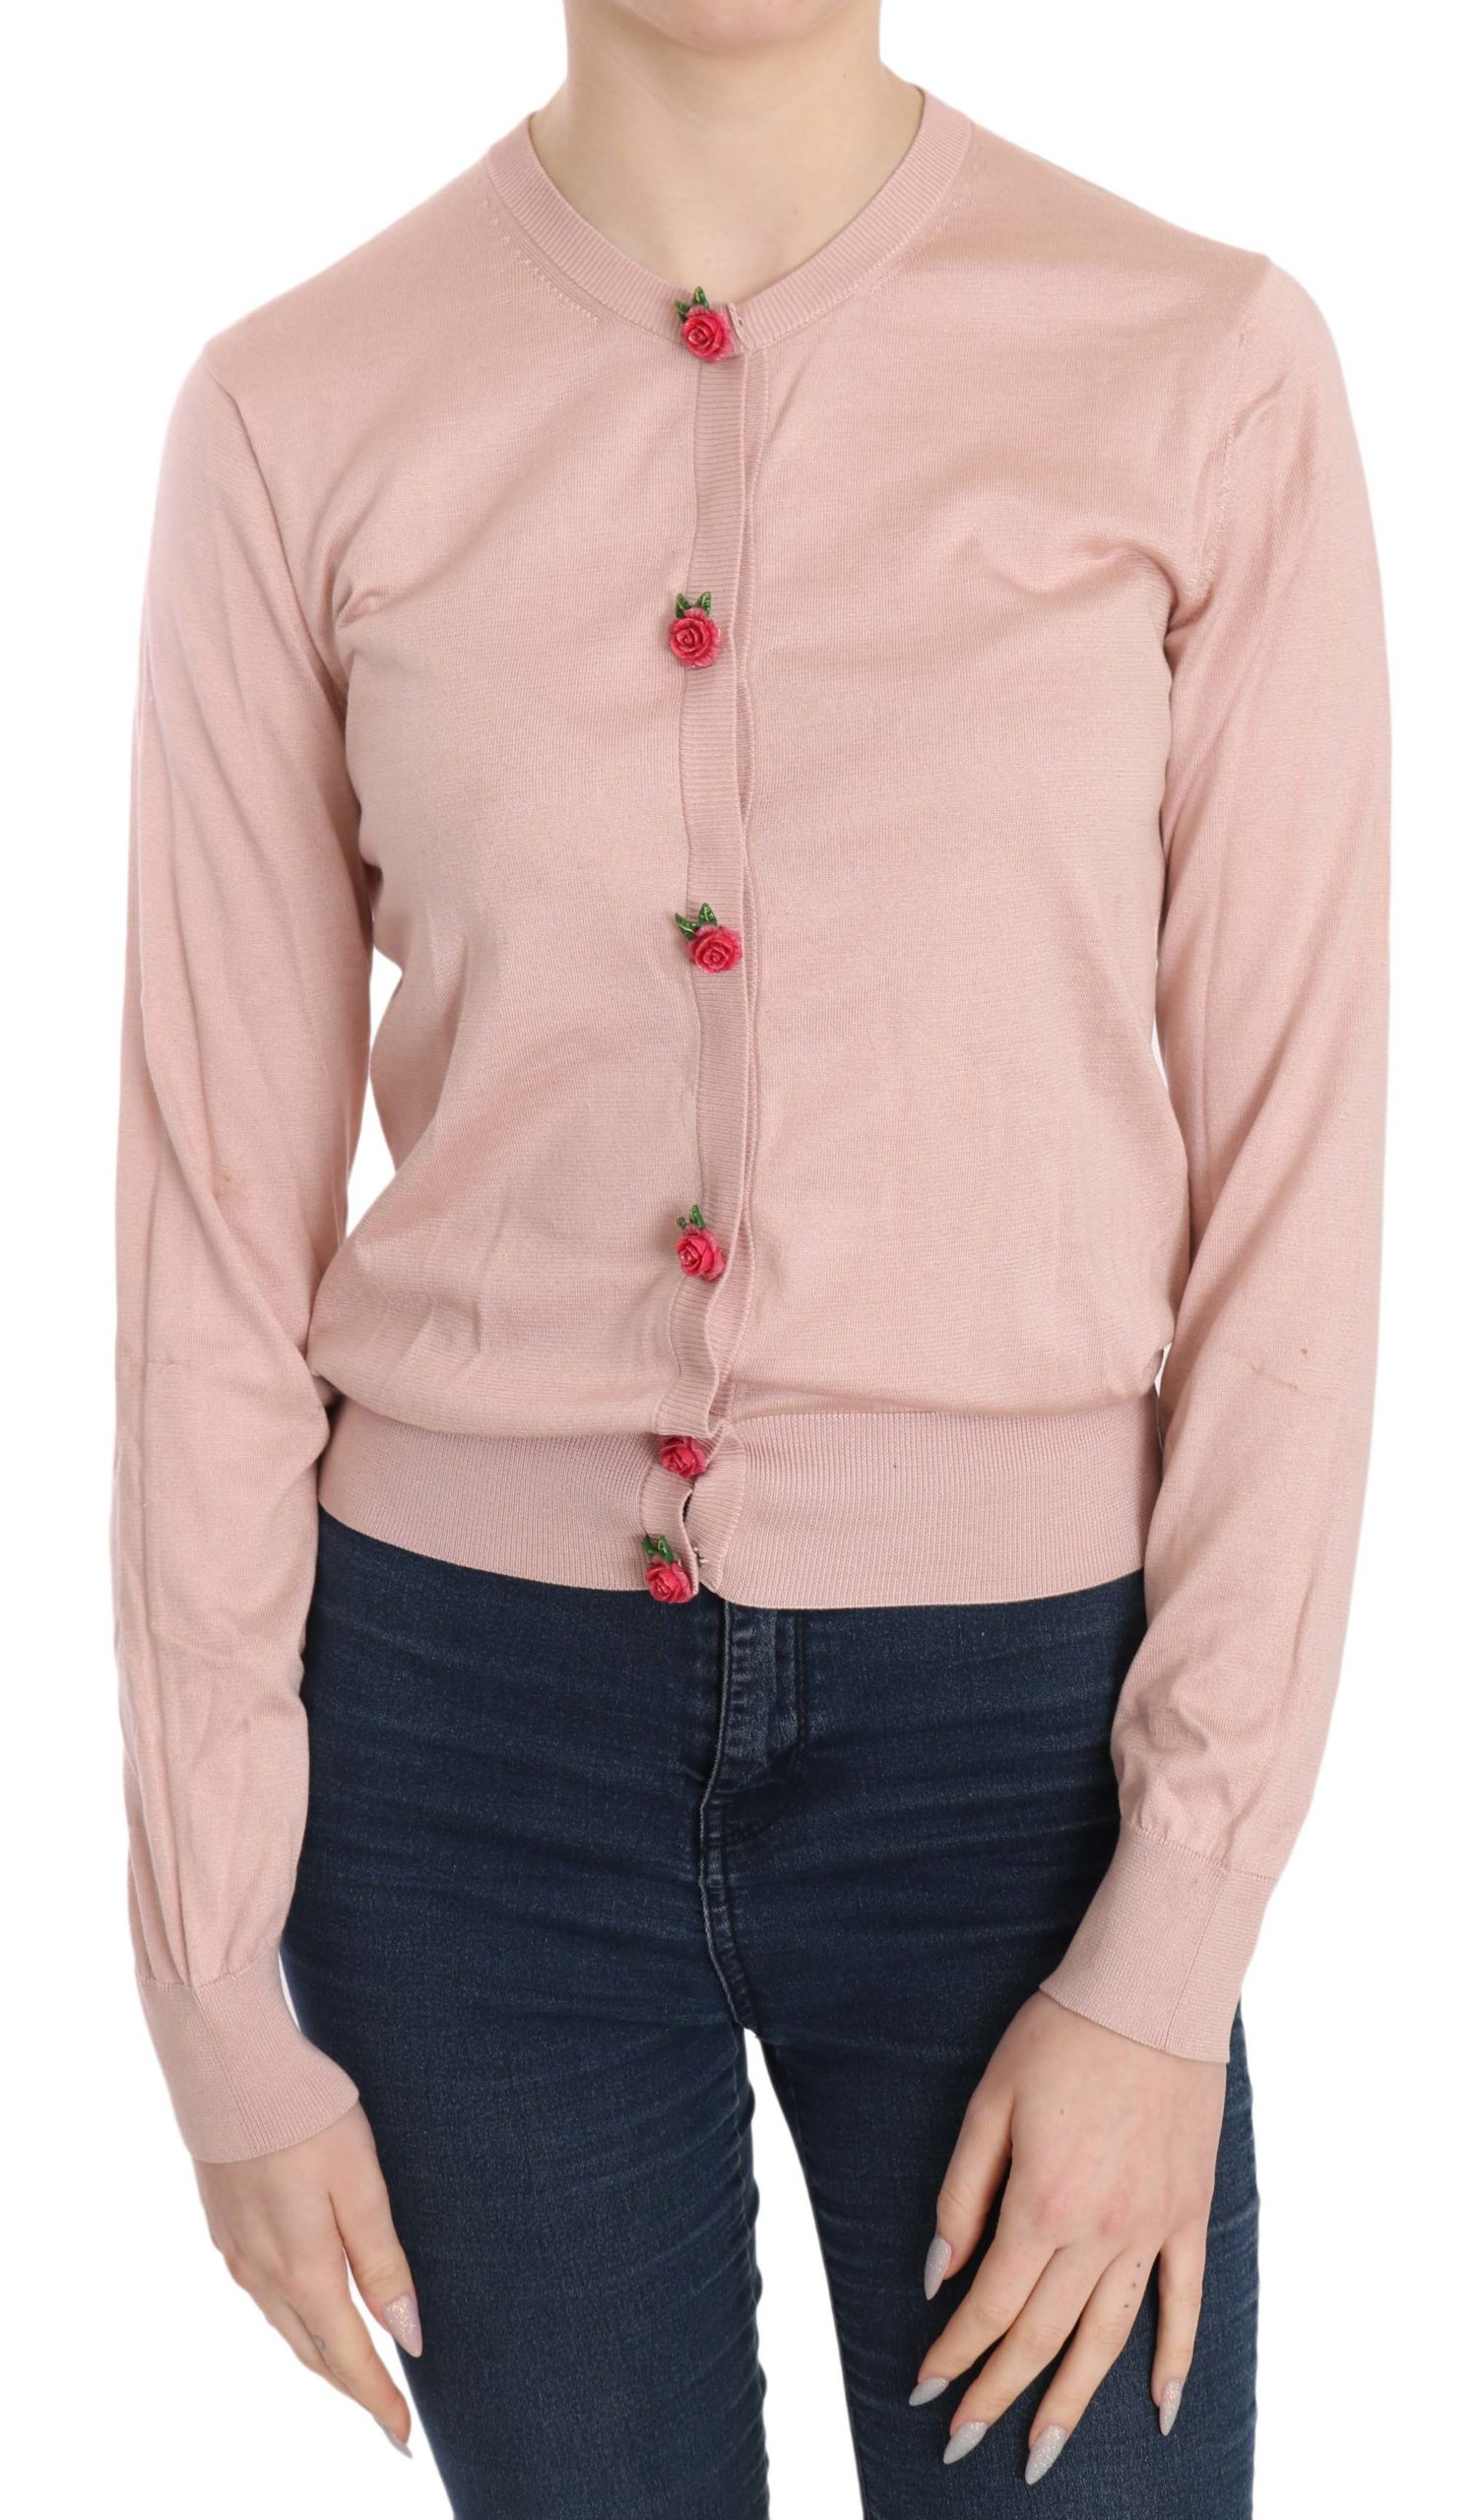 Dolce & Gabbana Women's Roses Silk Cardigan Pink TSH3646 - IT42|M